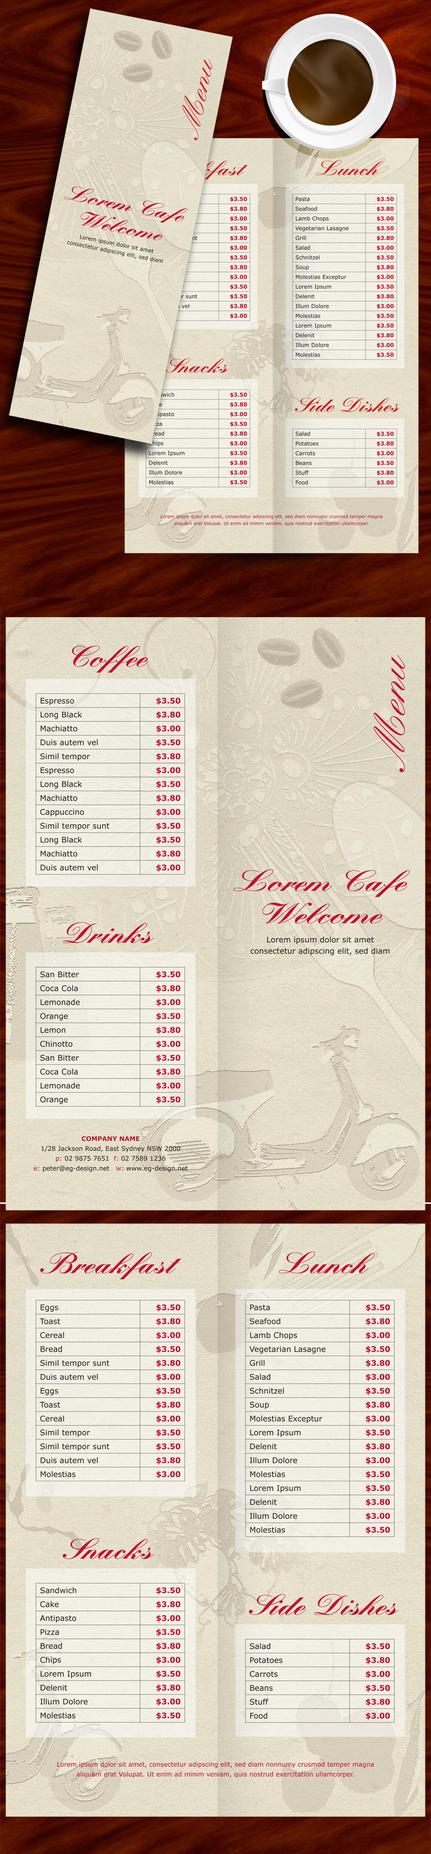 menu by egdesign01